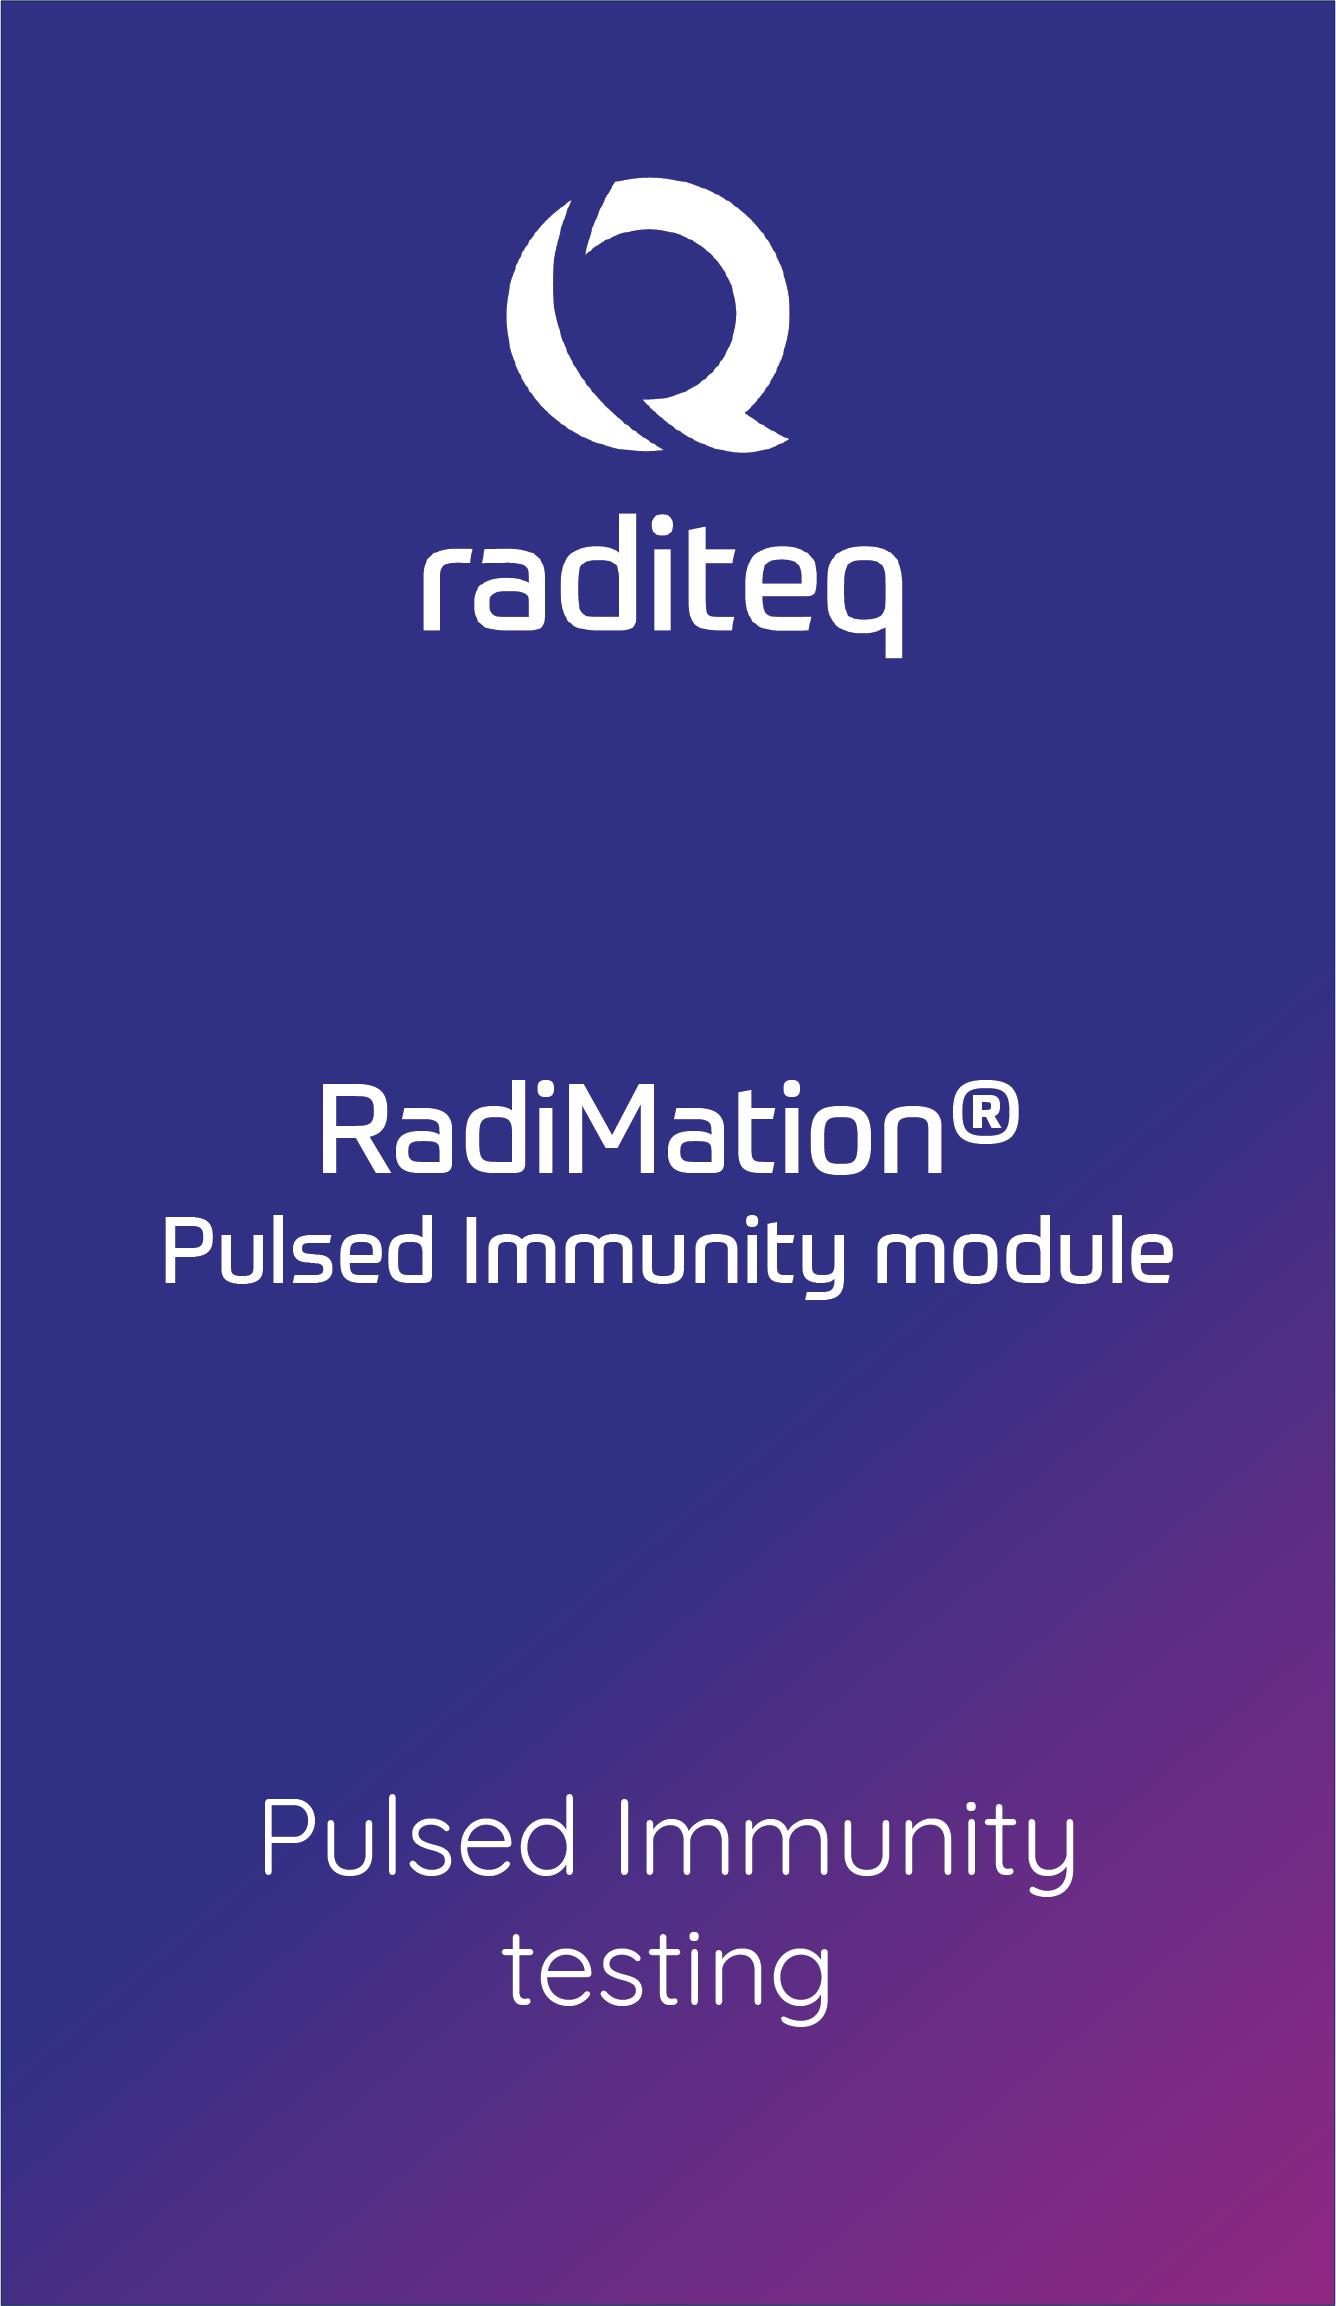 RadiMation®